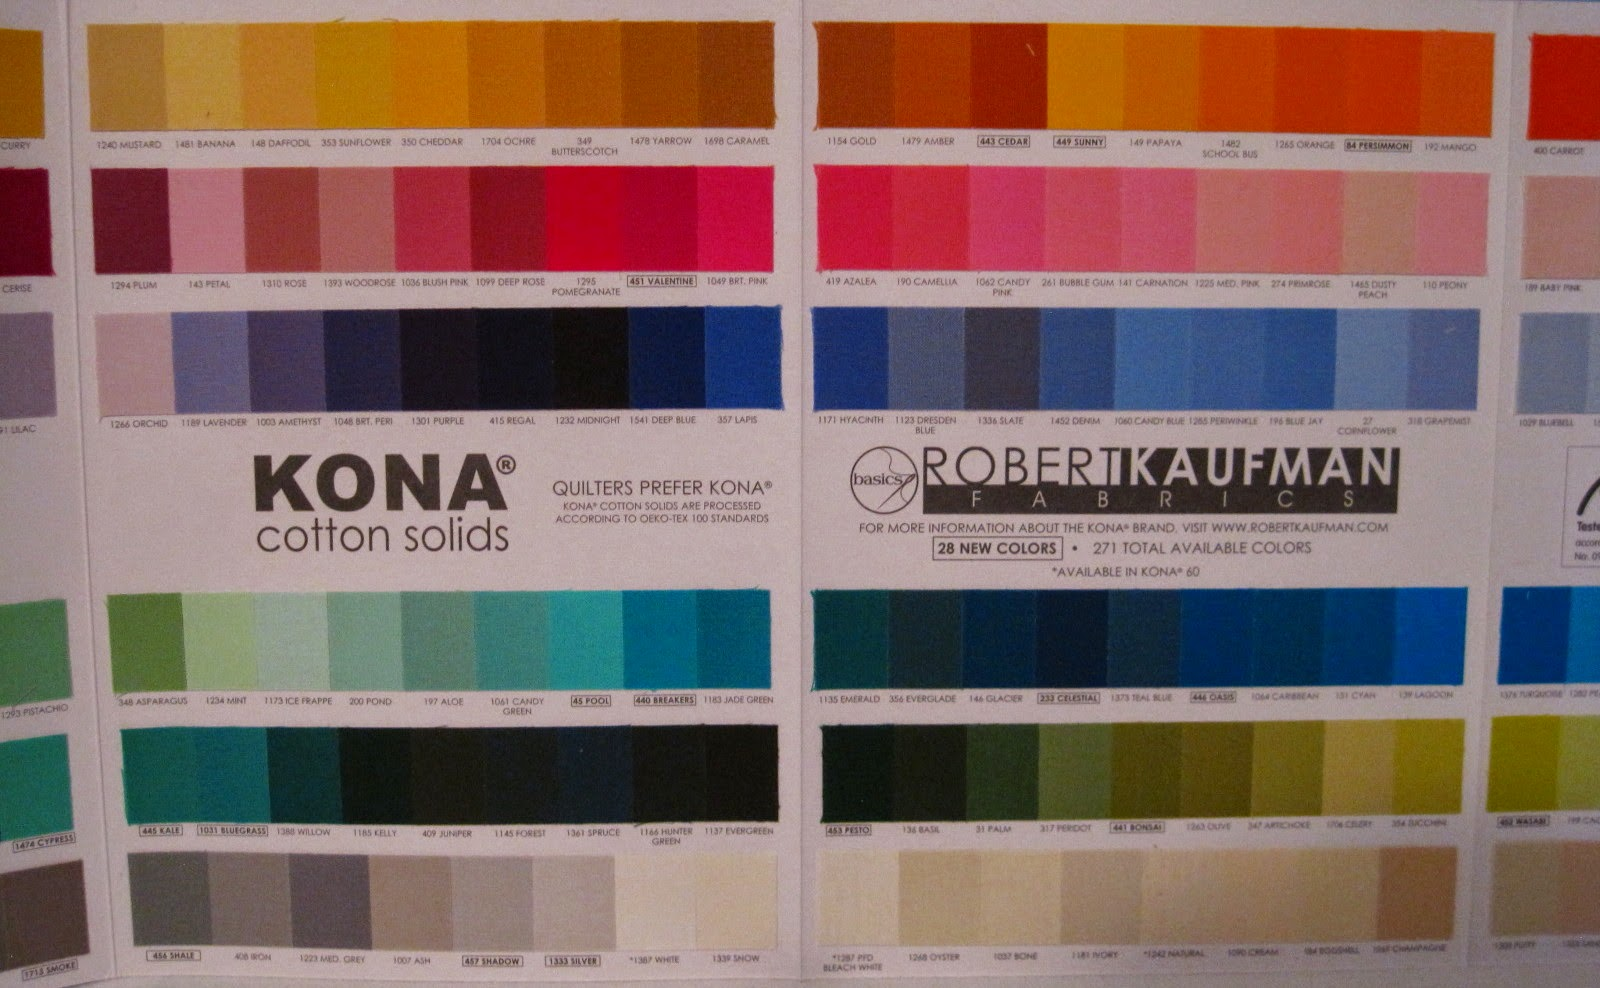 http://www.robertkaufman.com/fabrics/kona_cotton/